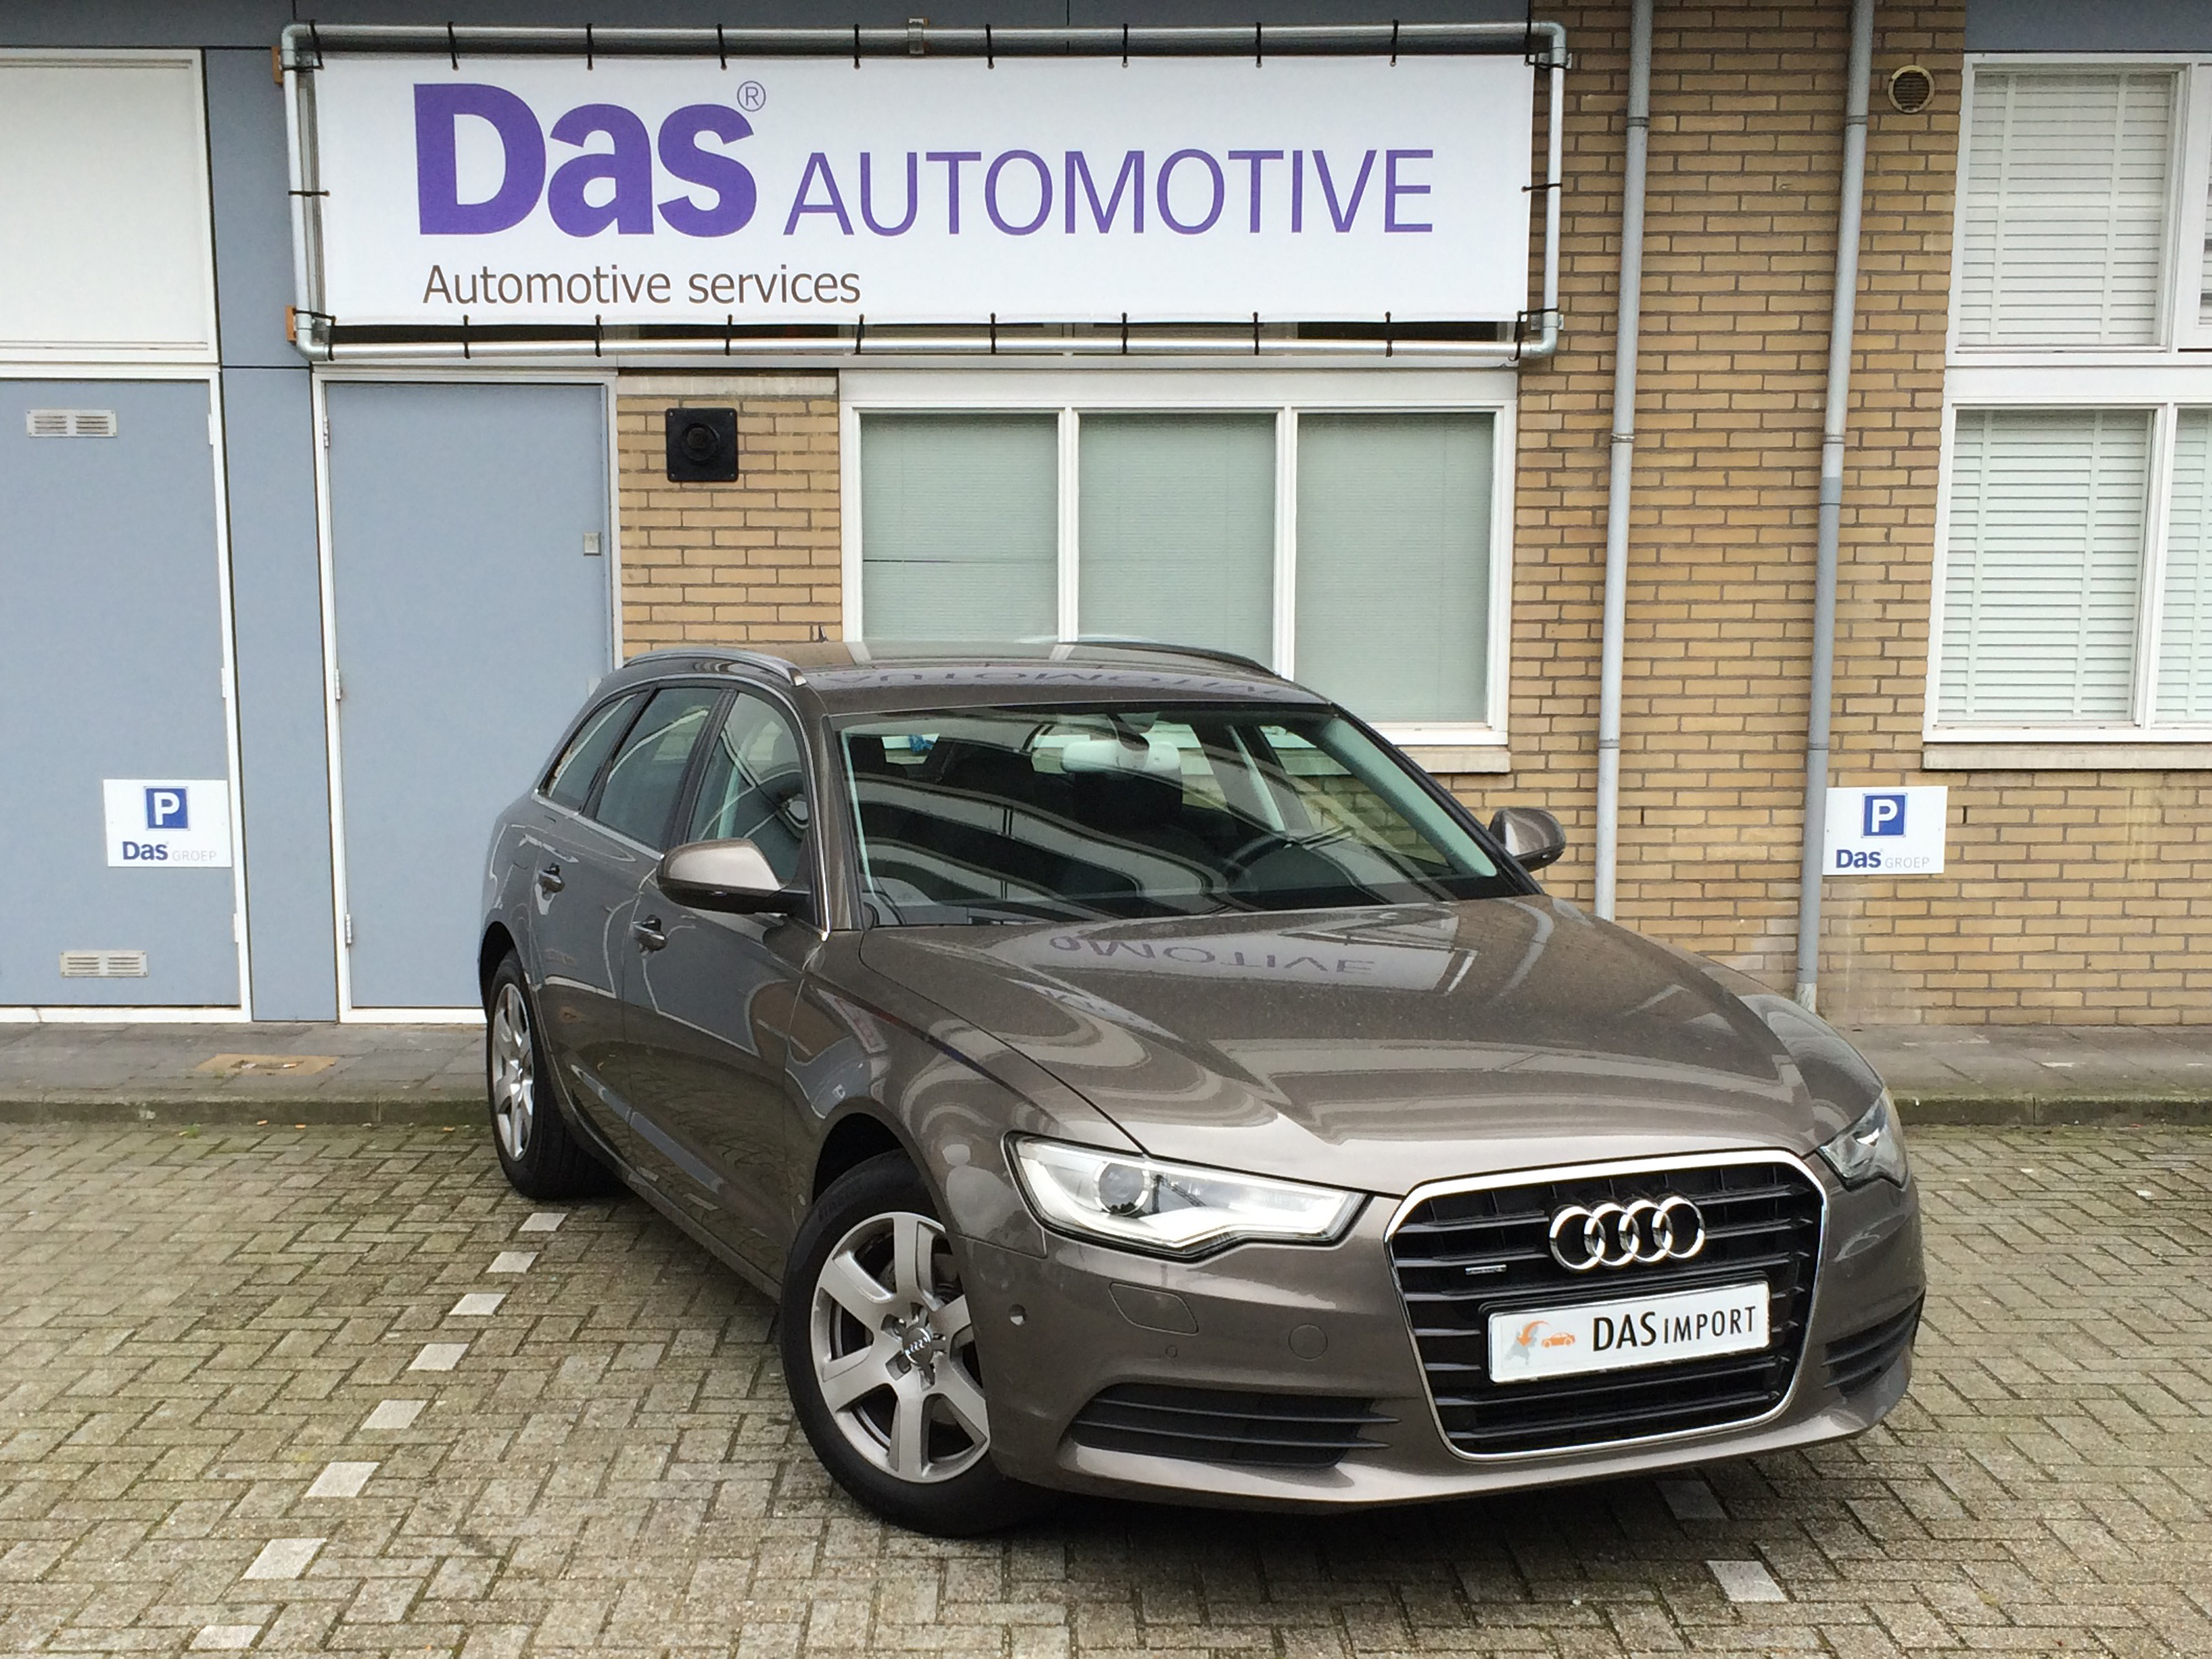 Importauto: Audi A6 Avant Diesel 3.0 TDI 150kW quattro S tronic 5/2013